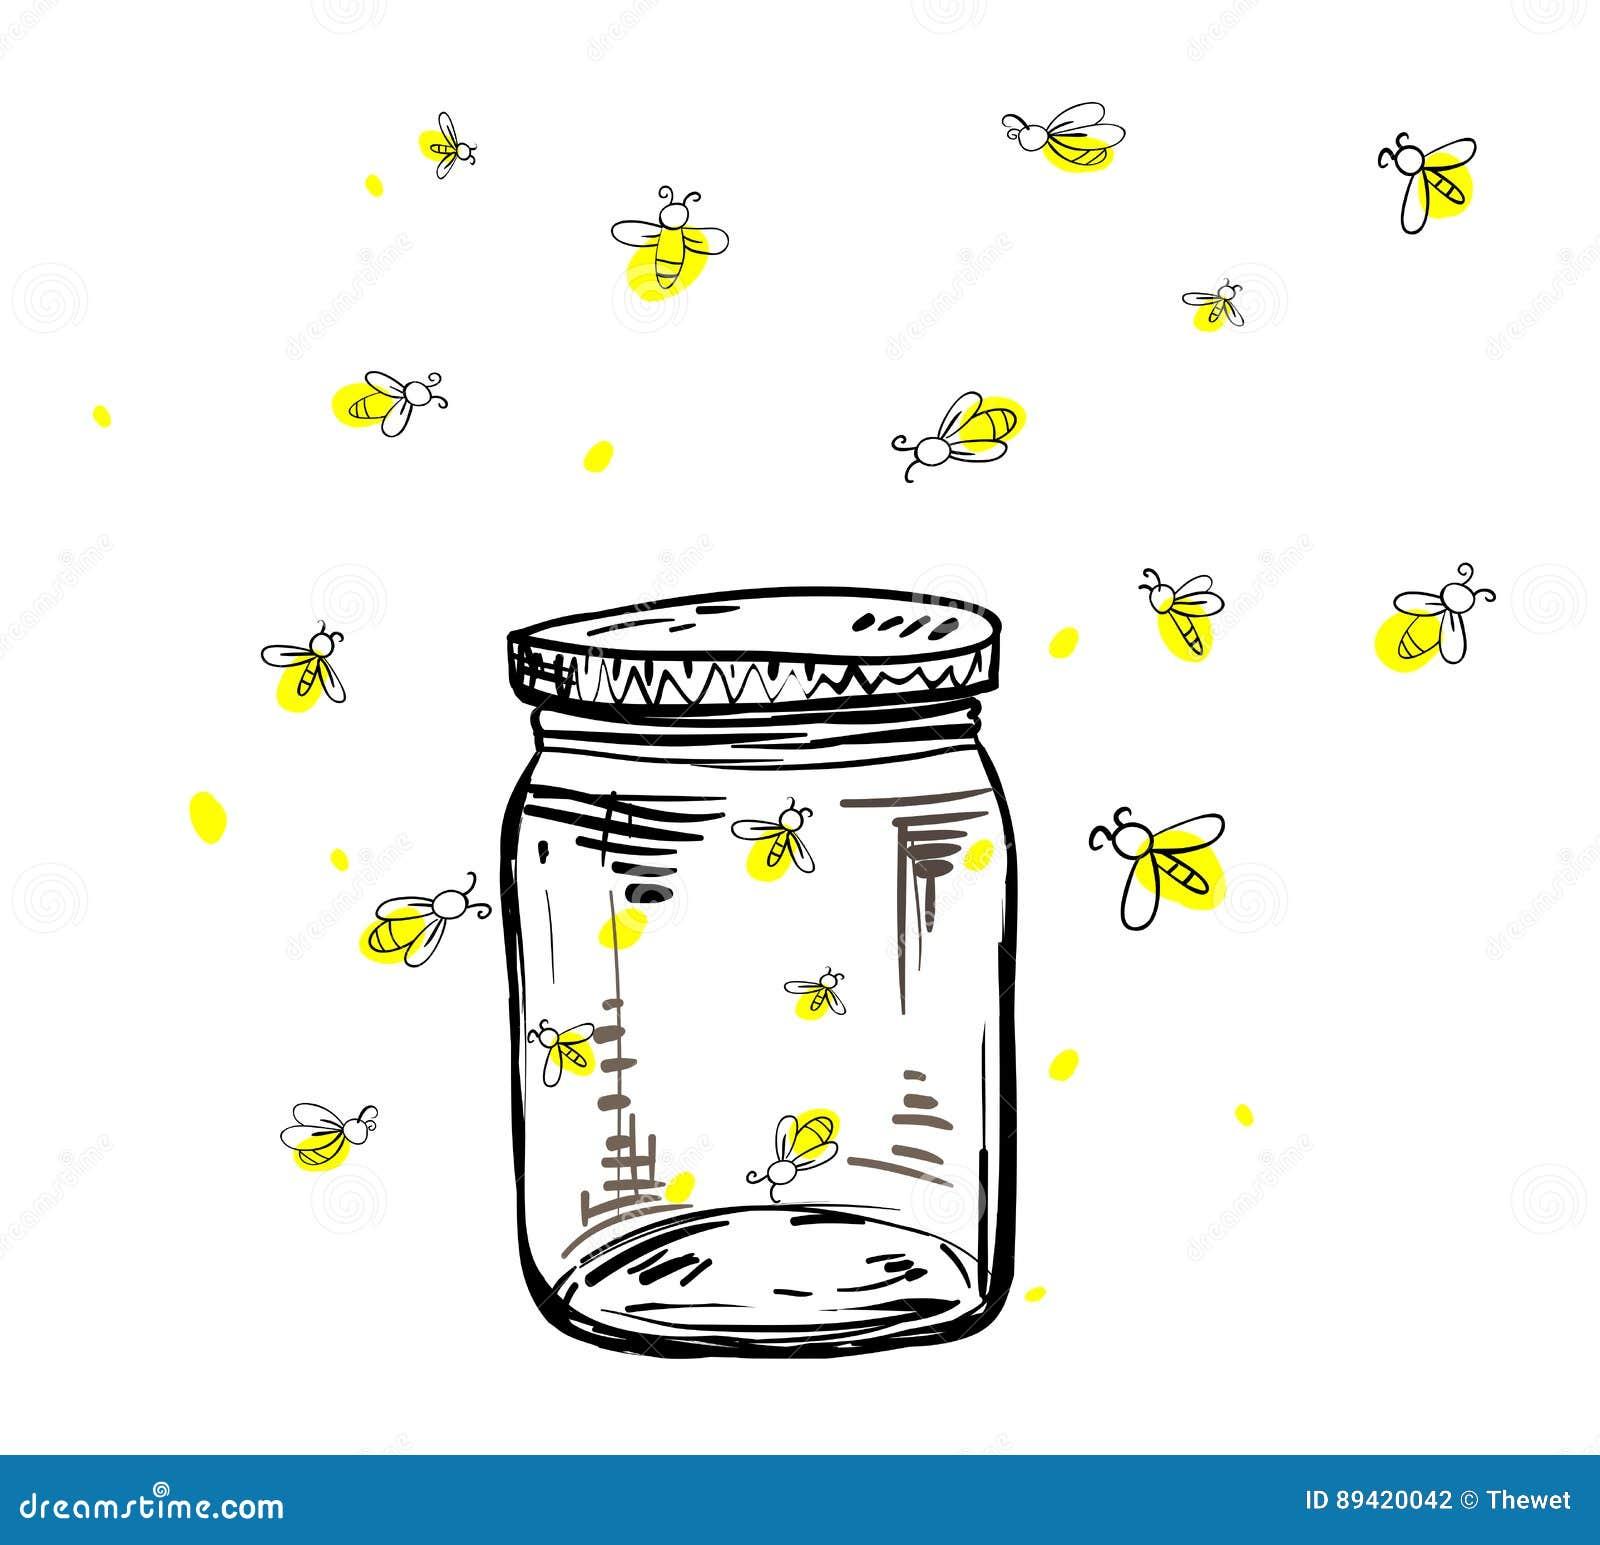 fireflies flying around the jar stock vector